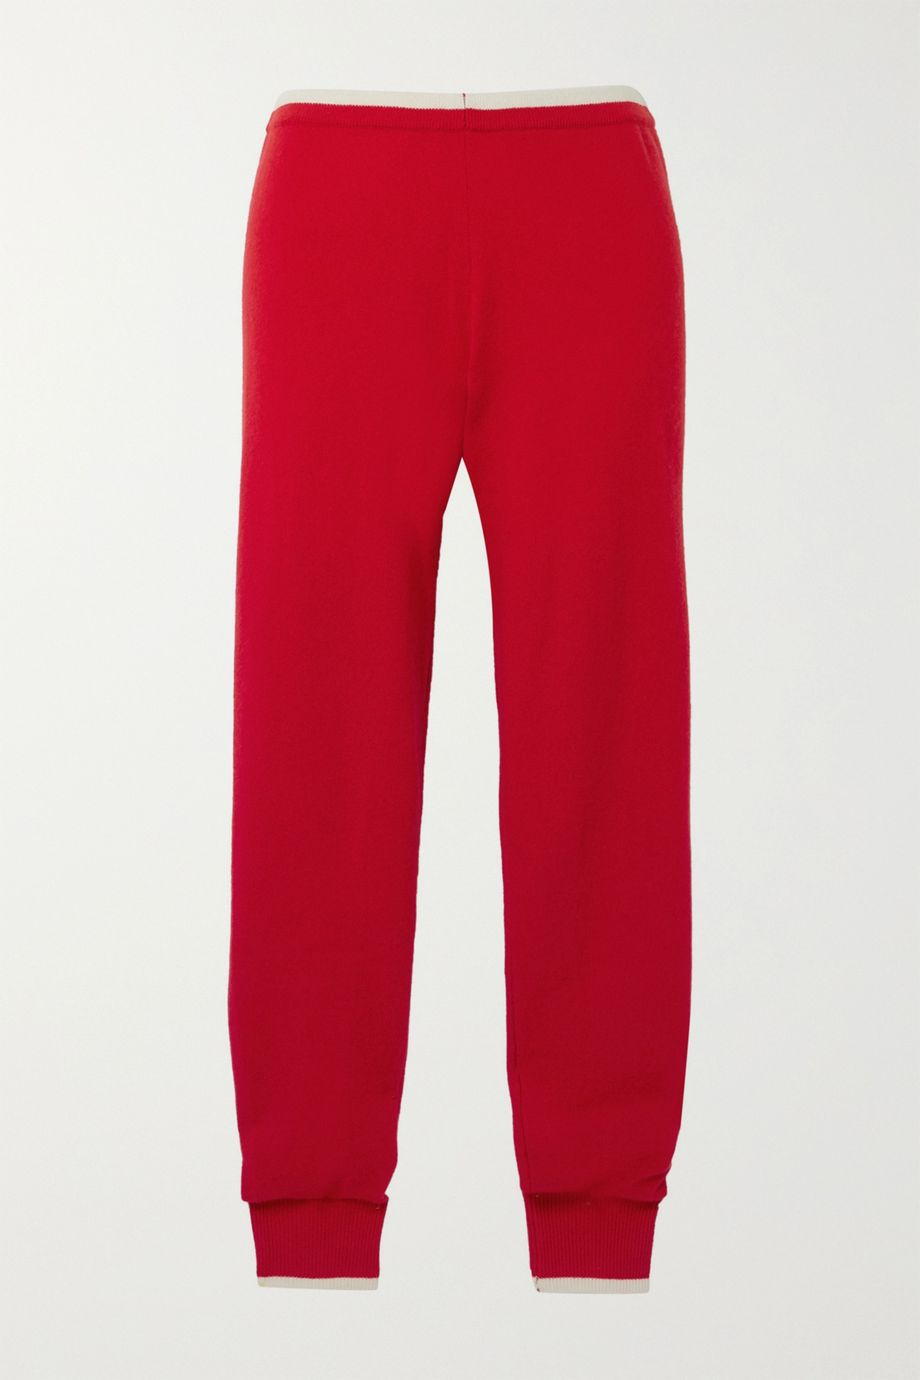 Madeleine Thompson Plutus two-tone cashmere track pants